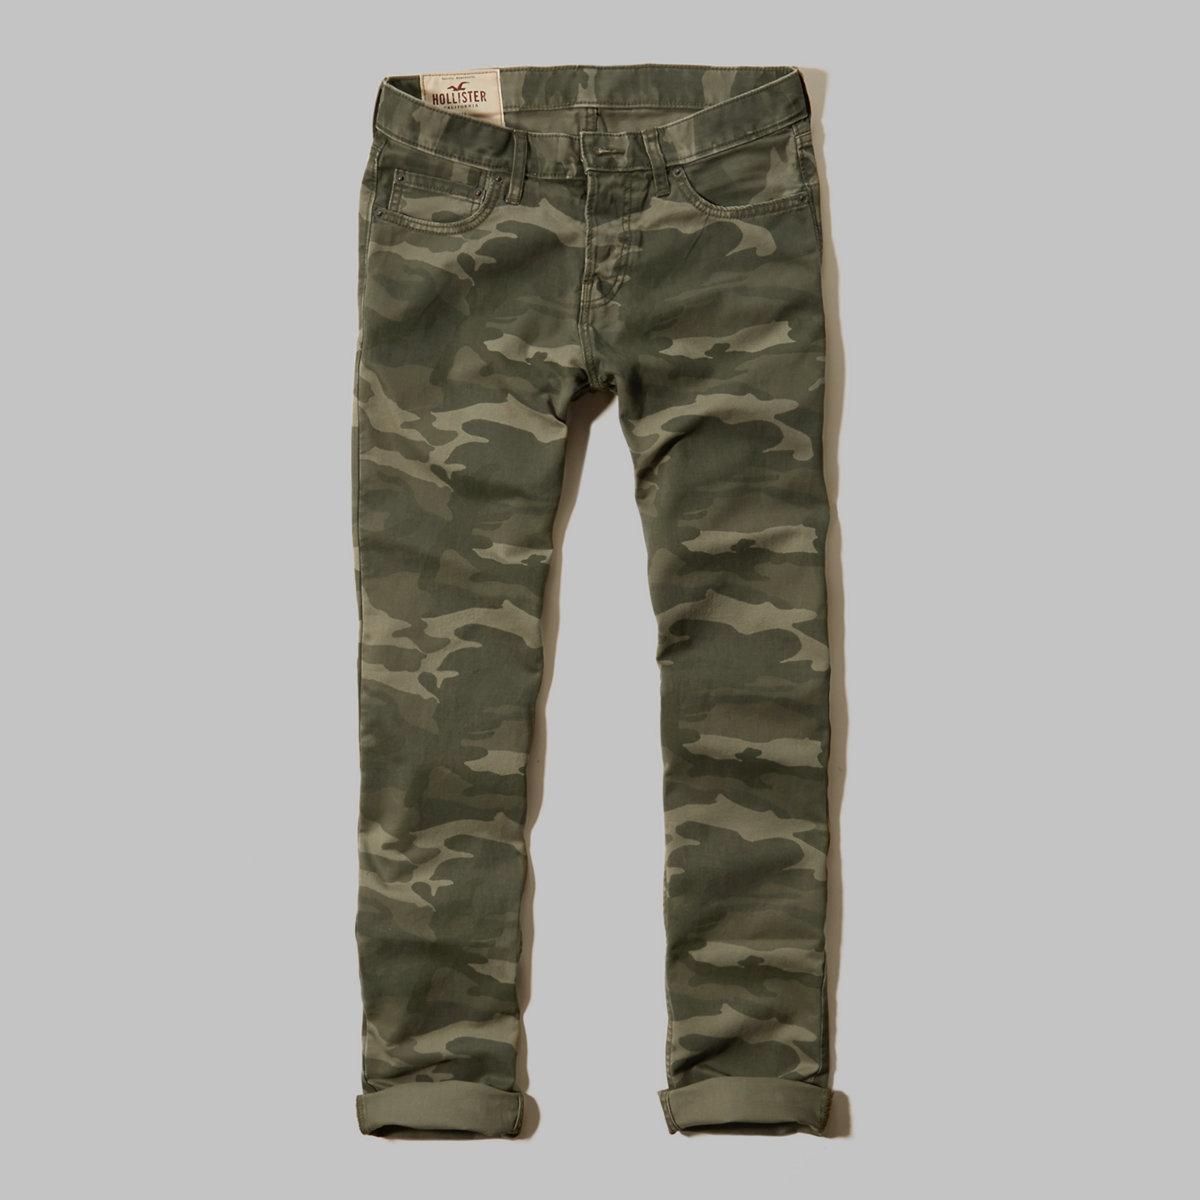 Hollister Skinny 5 Pocket Button Fly Pants